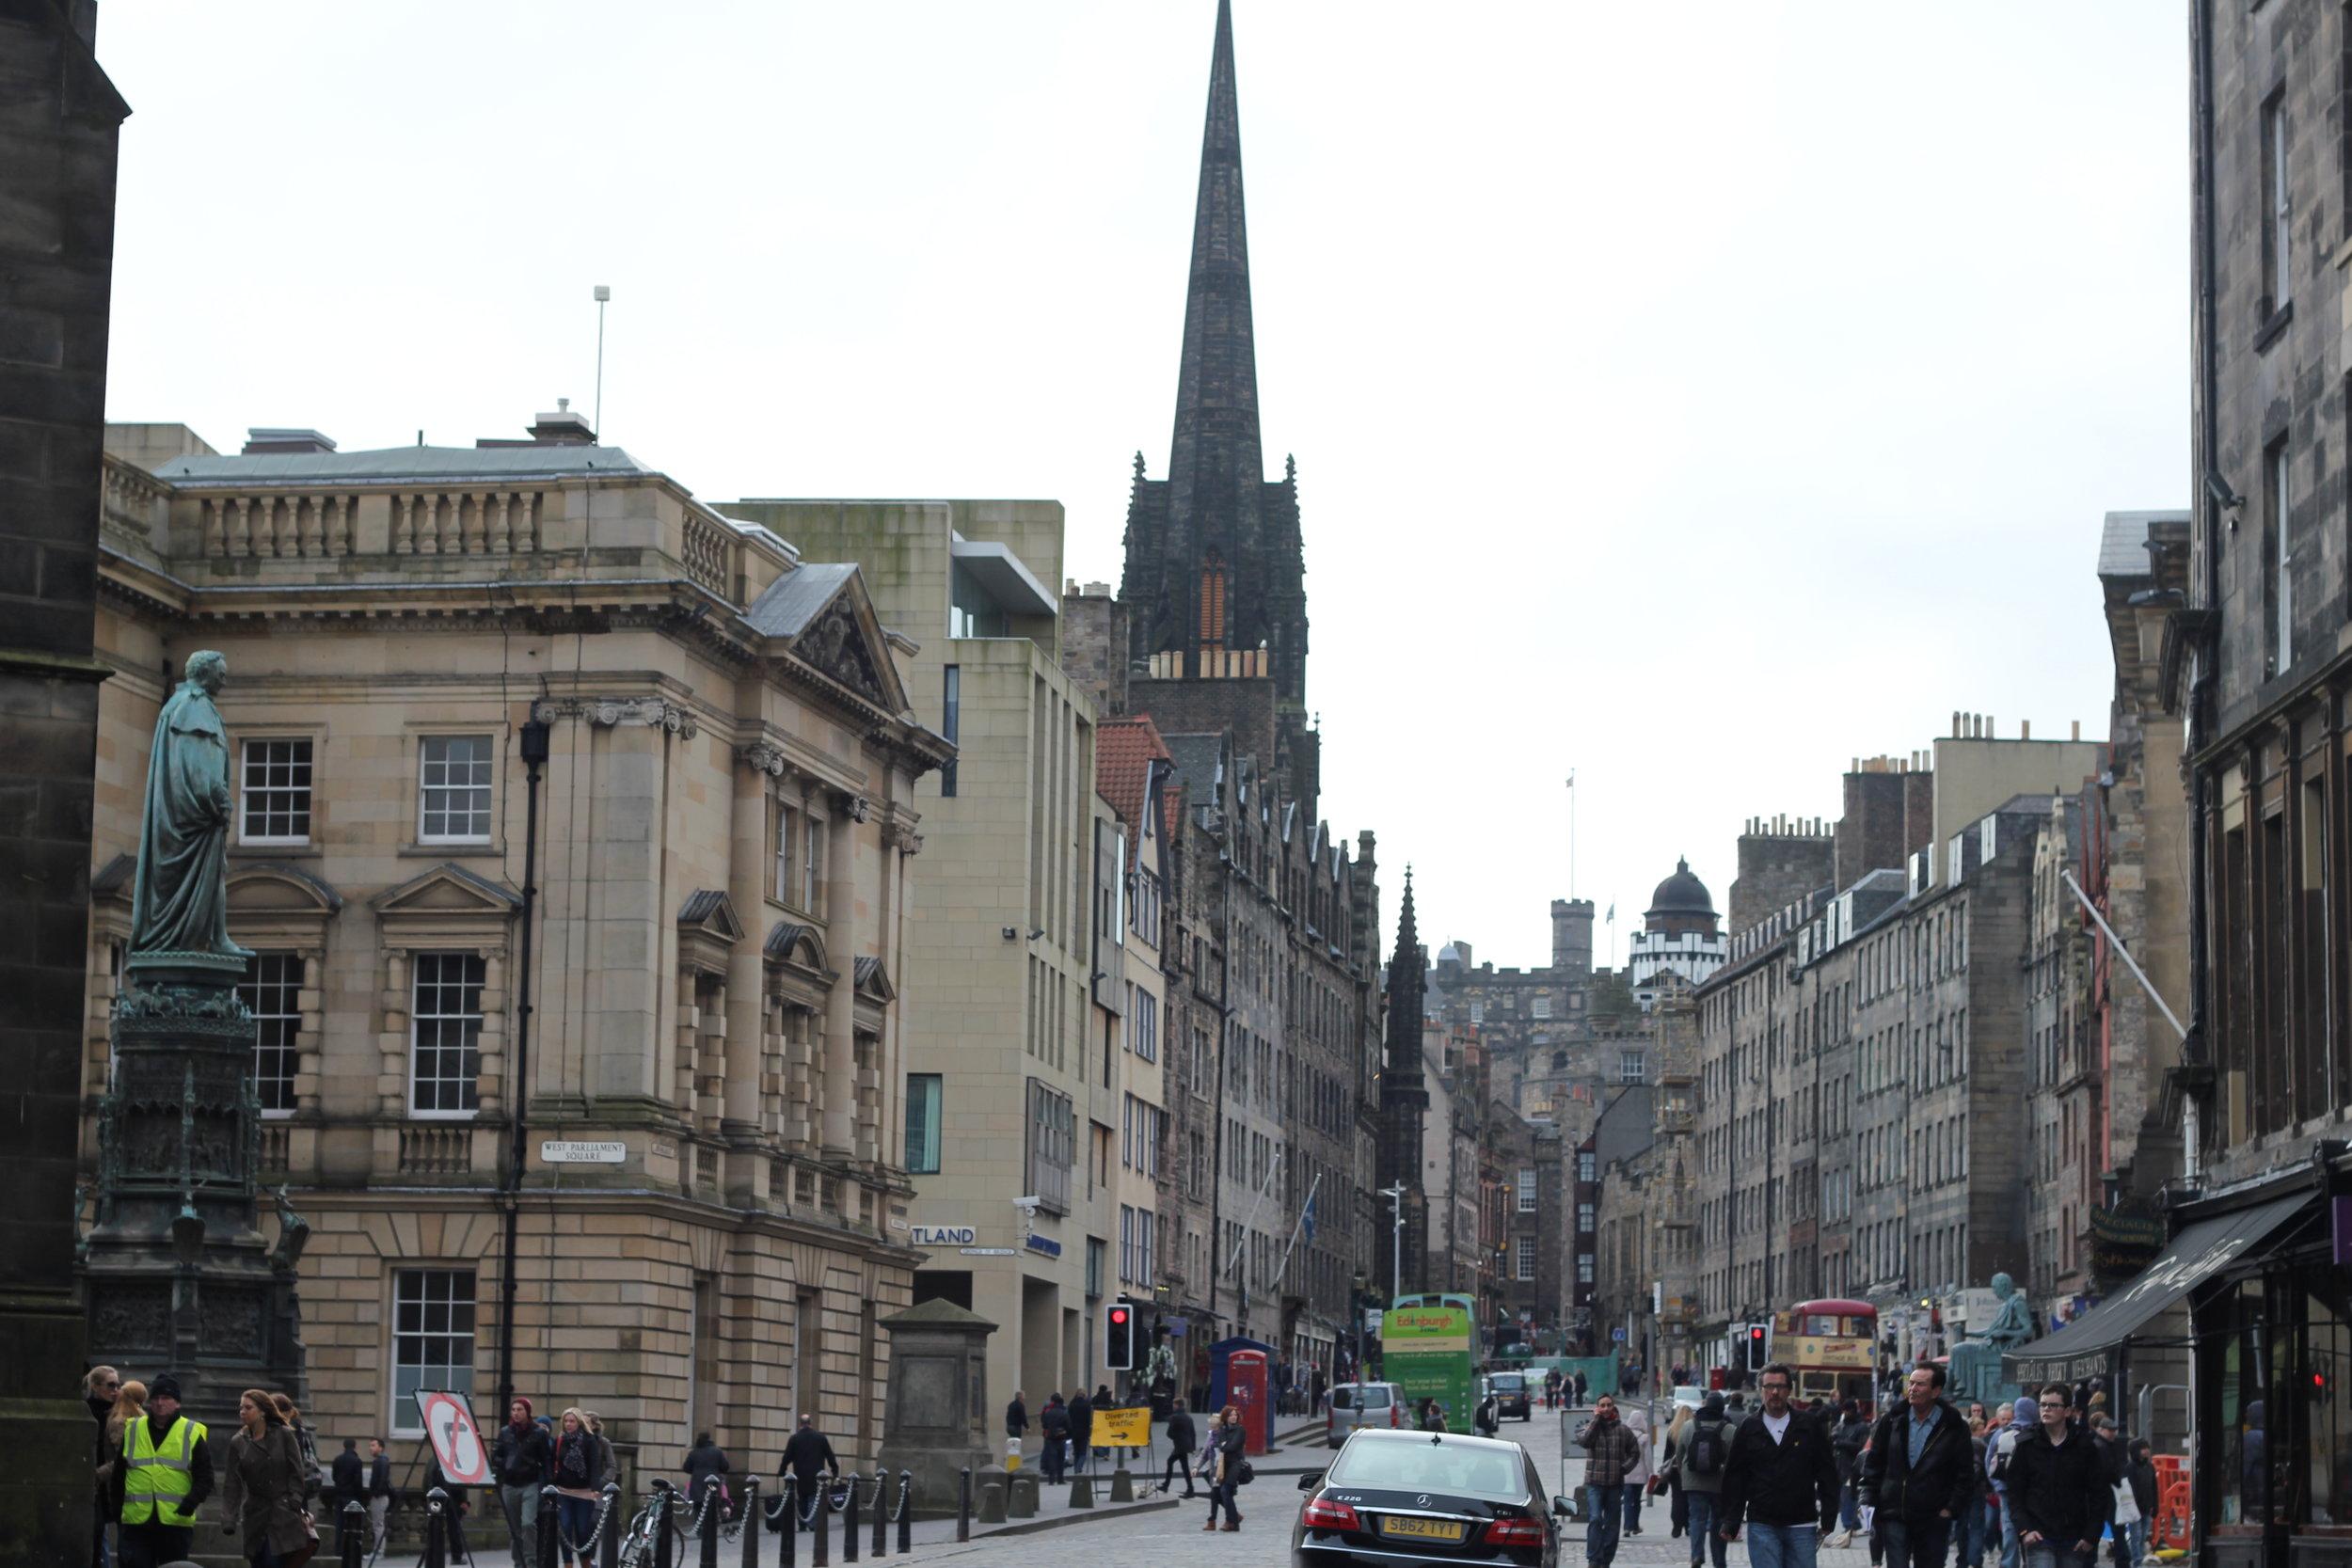 Street view of Edinburgh's Royal Mile